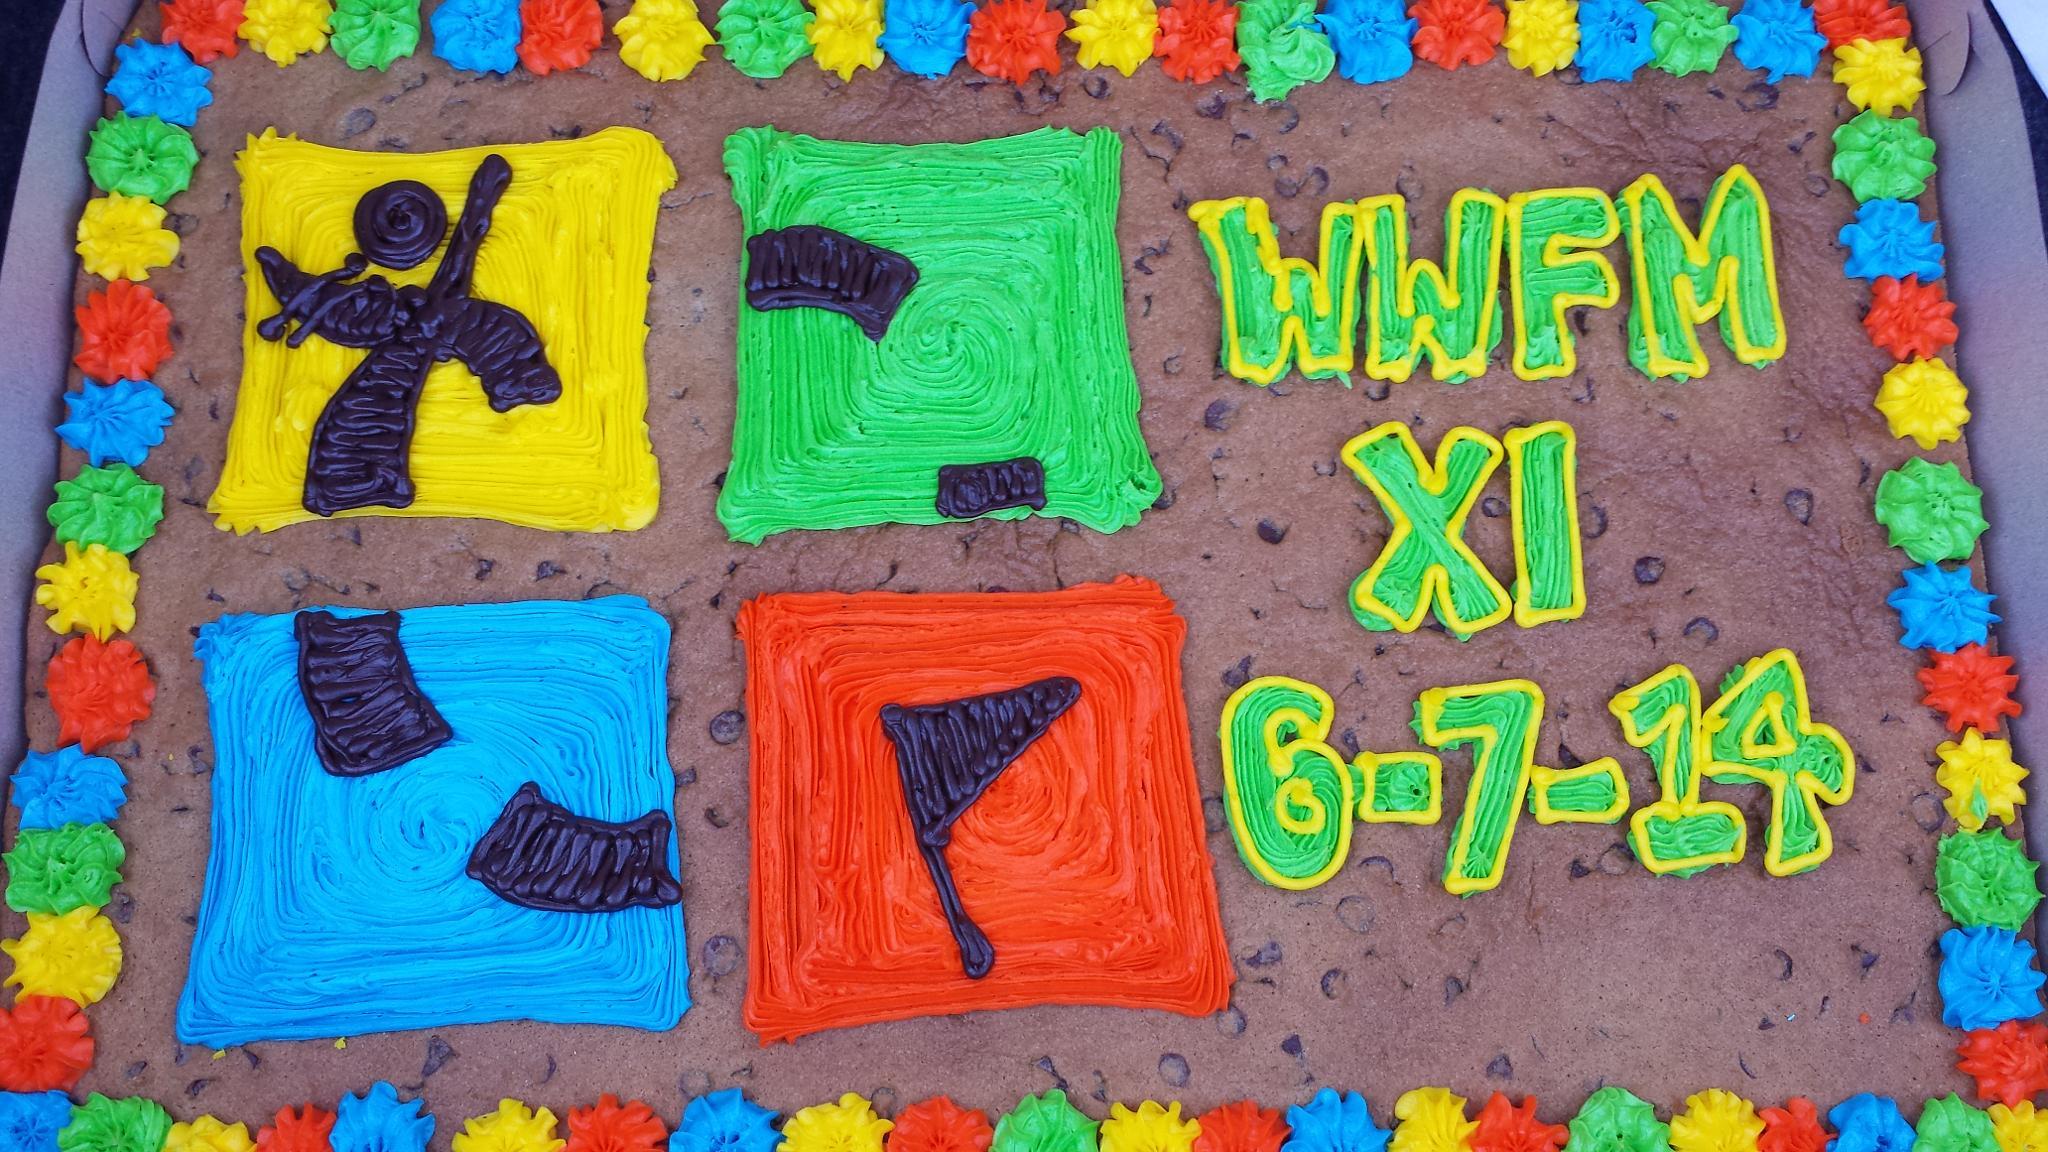 WWFM XI by bgarringer